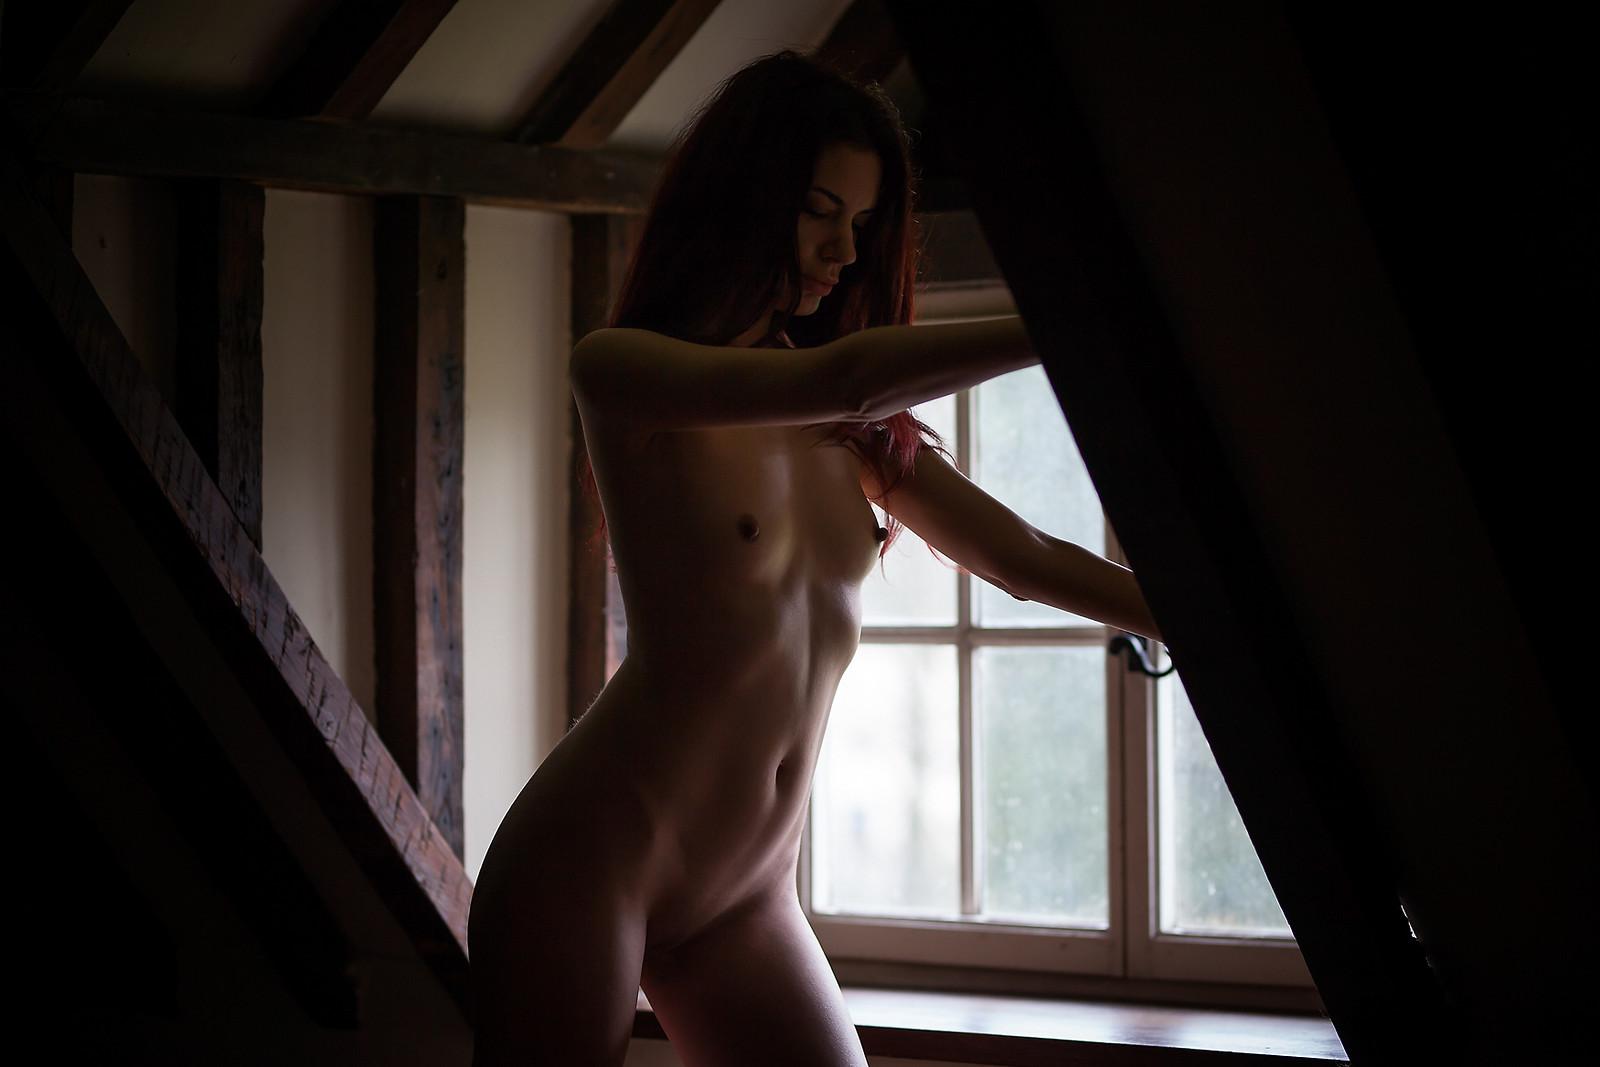 German Kinky Female Singer Nude On Stage In Nos Concert